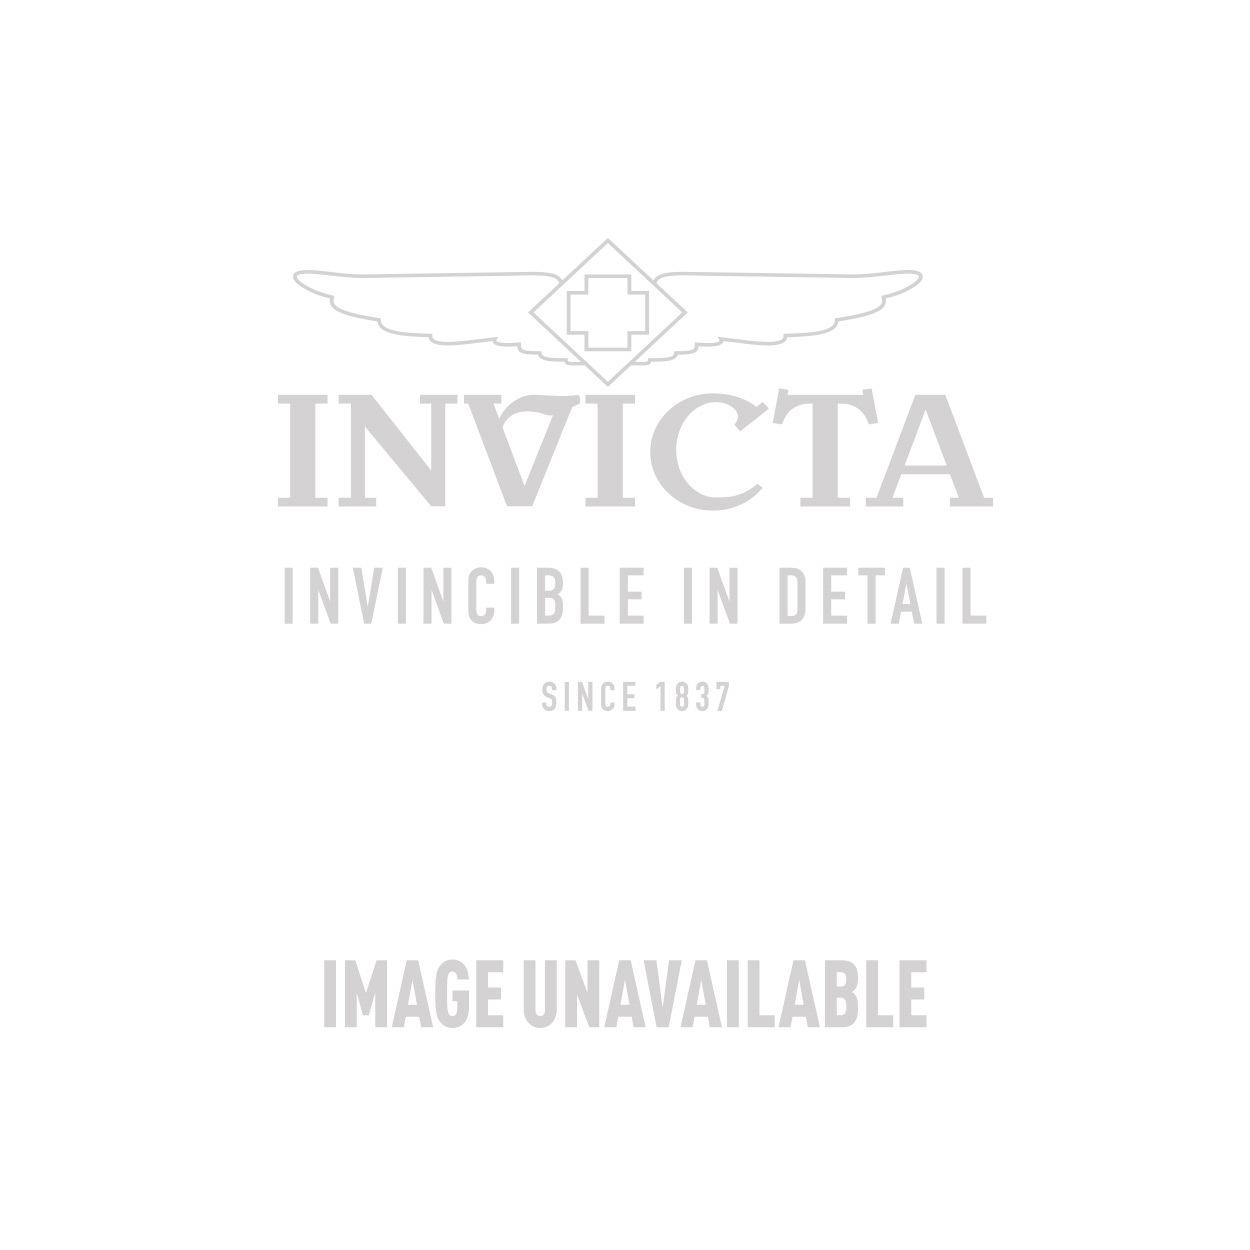 Invicta Speedway Quartz Watch - Black, Stainless Steel case with Steel, Black tone Polyurethane band - Model 17202